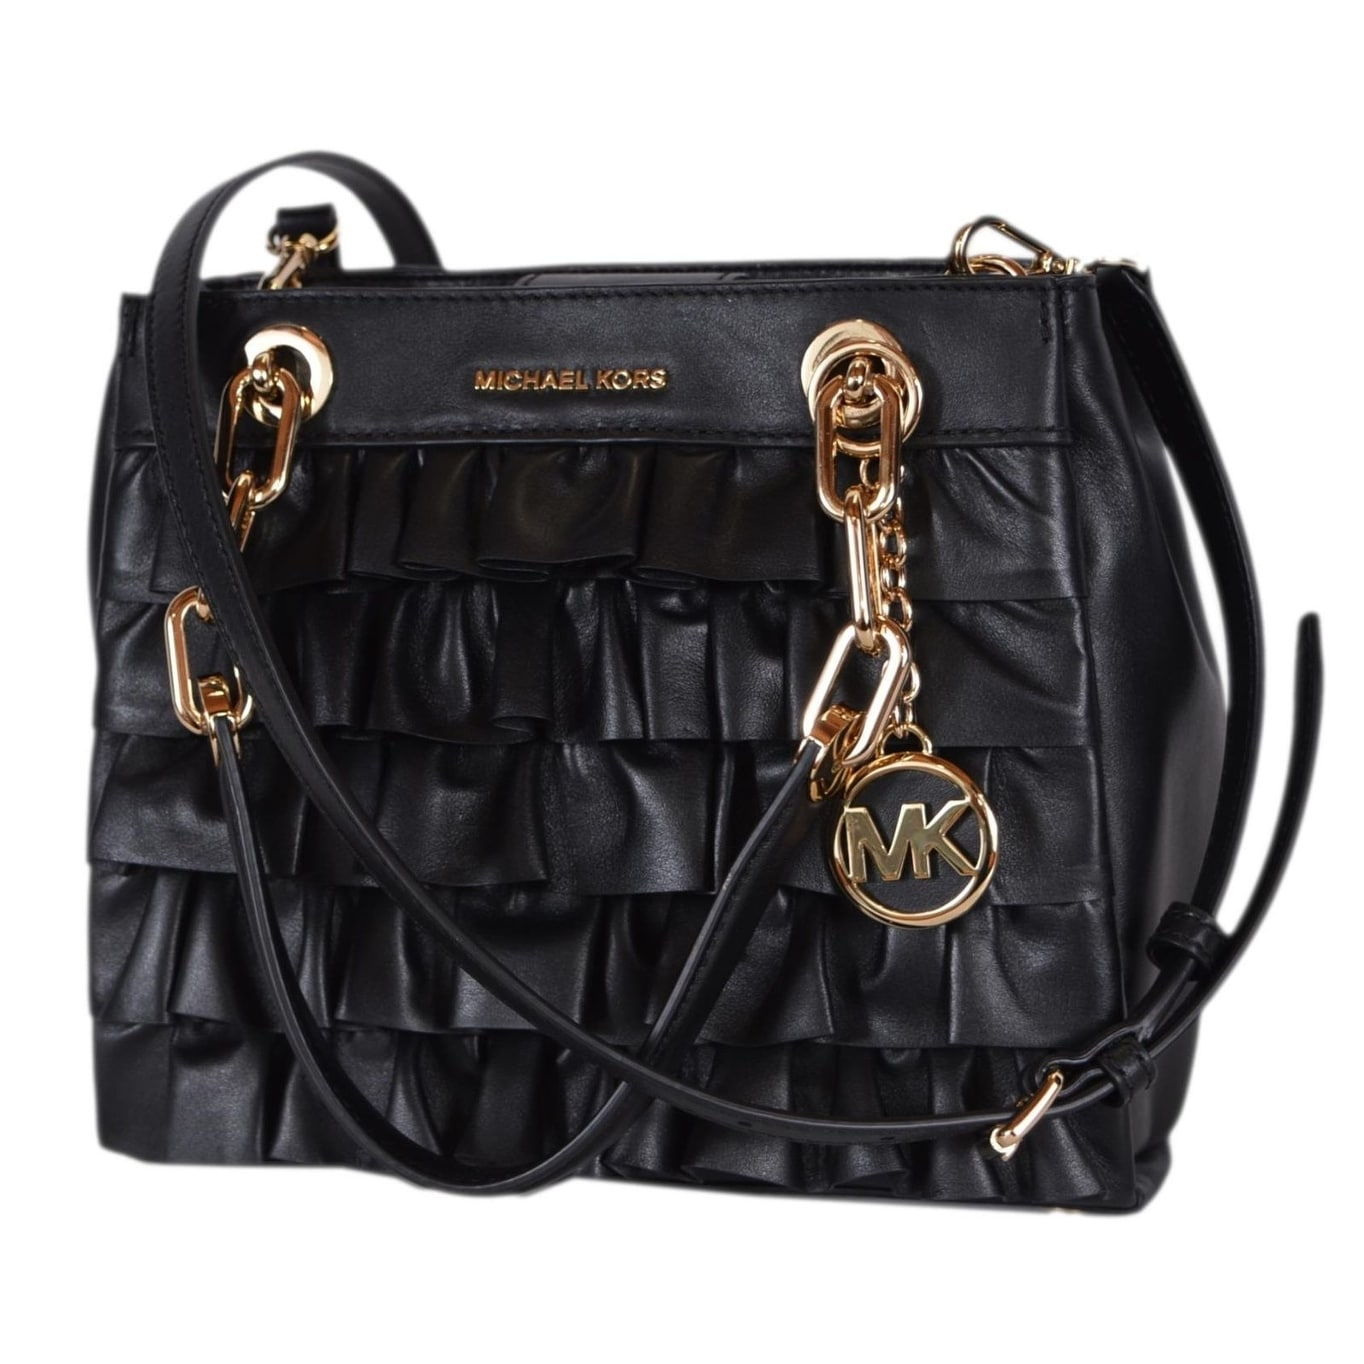 31893fe85e9d Shop Michael Kors Small Black Leather Ruffled Cynthia Satchel Purse Handbag  - Free Shipping Today - Overstock - 22807534